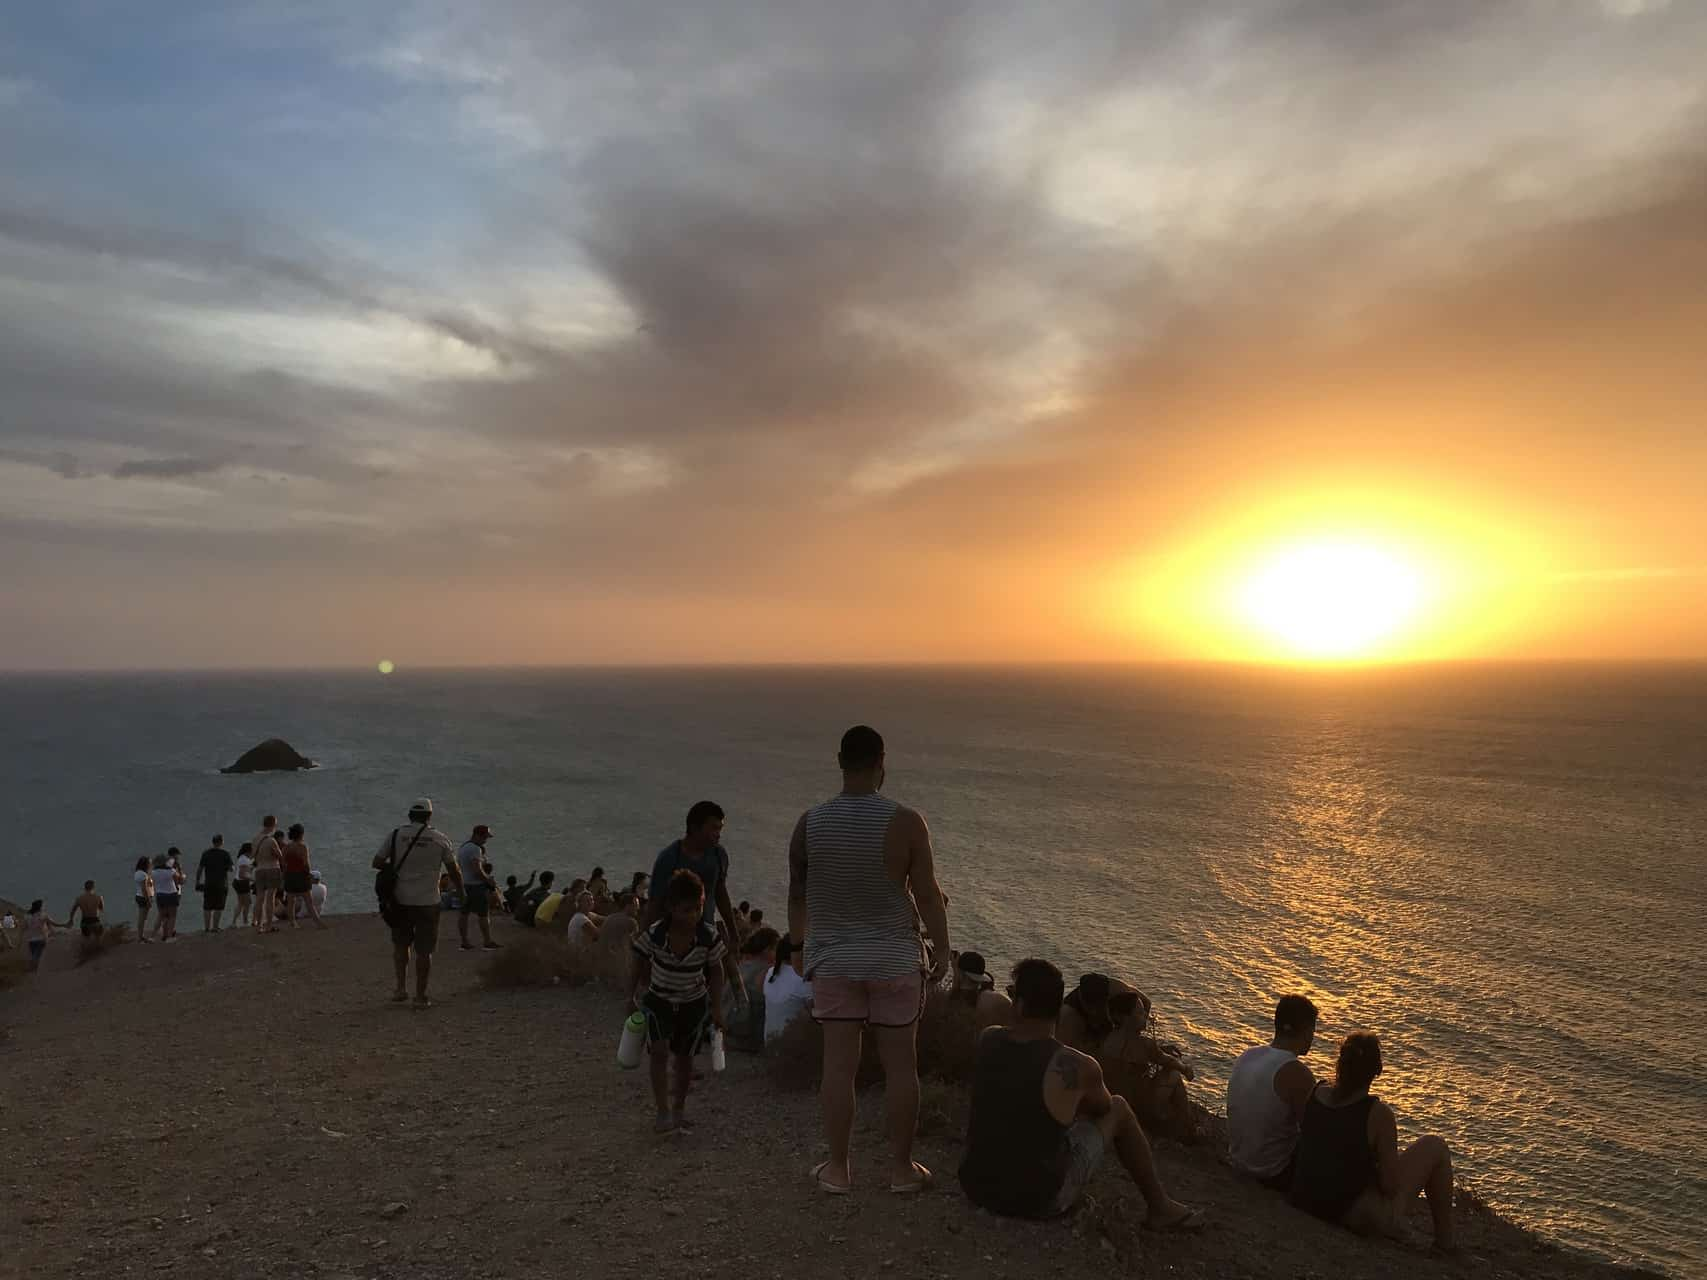 Touristenansammlung am Cabo de la Vela (Bild: M. Schäfer)